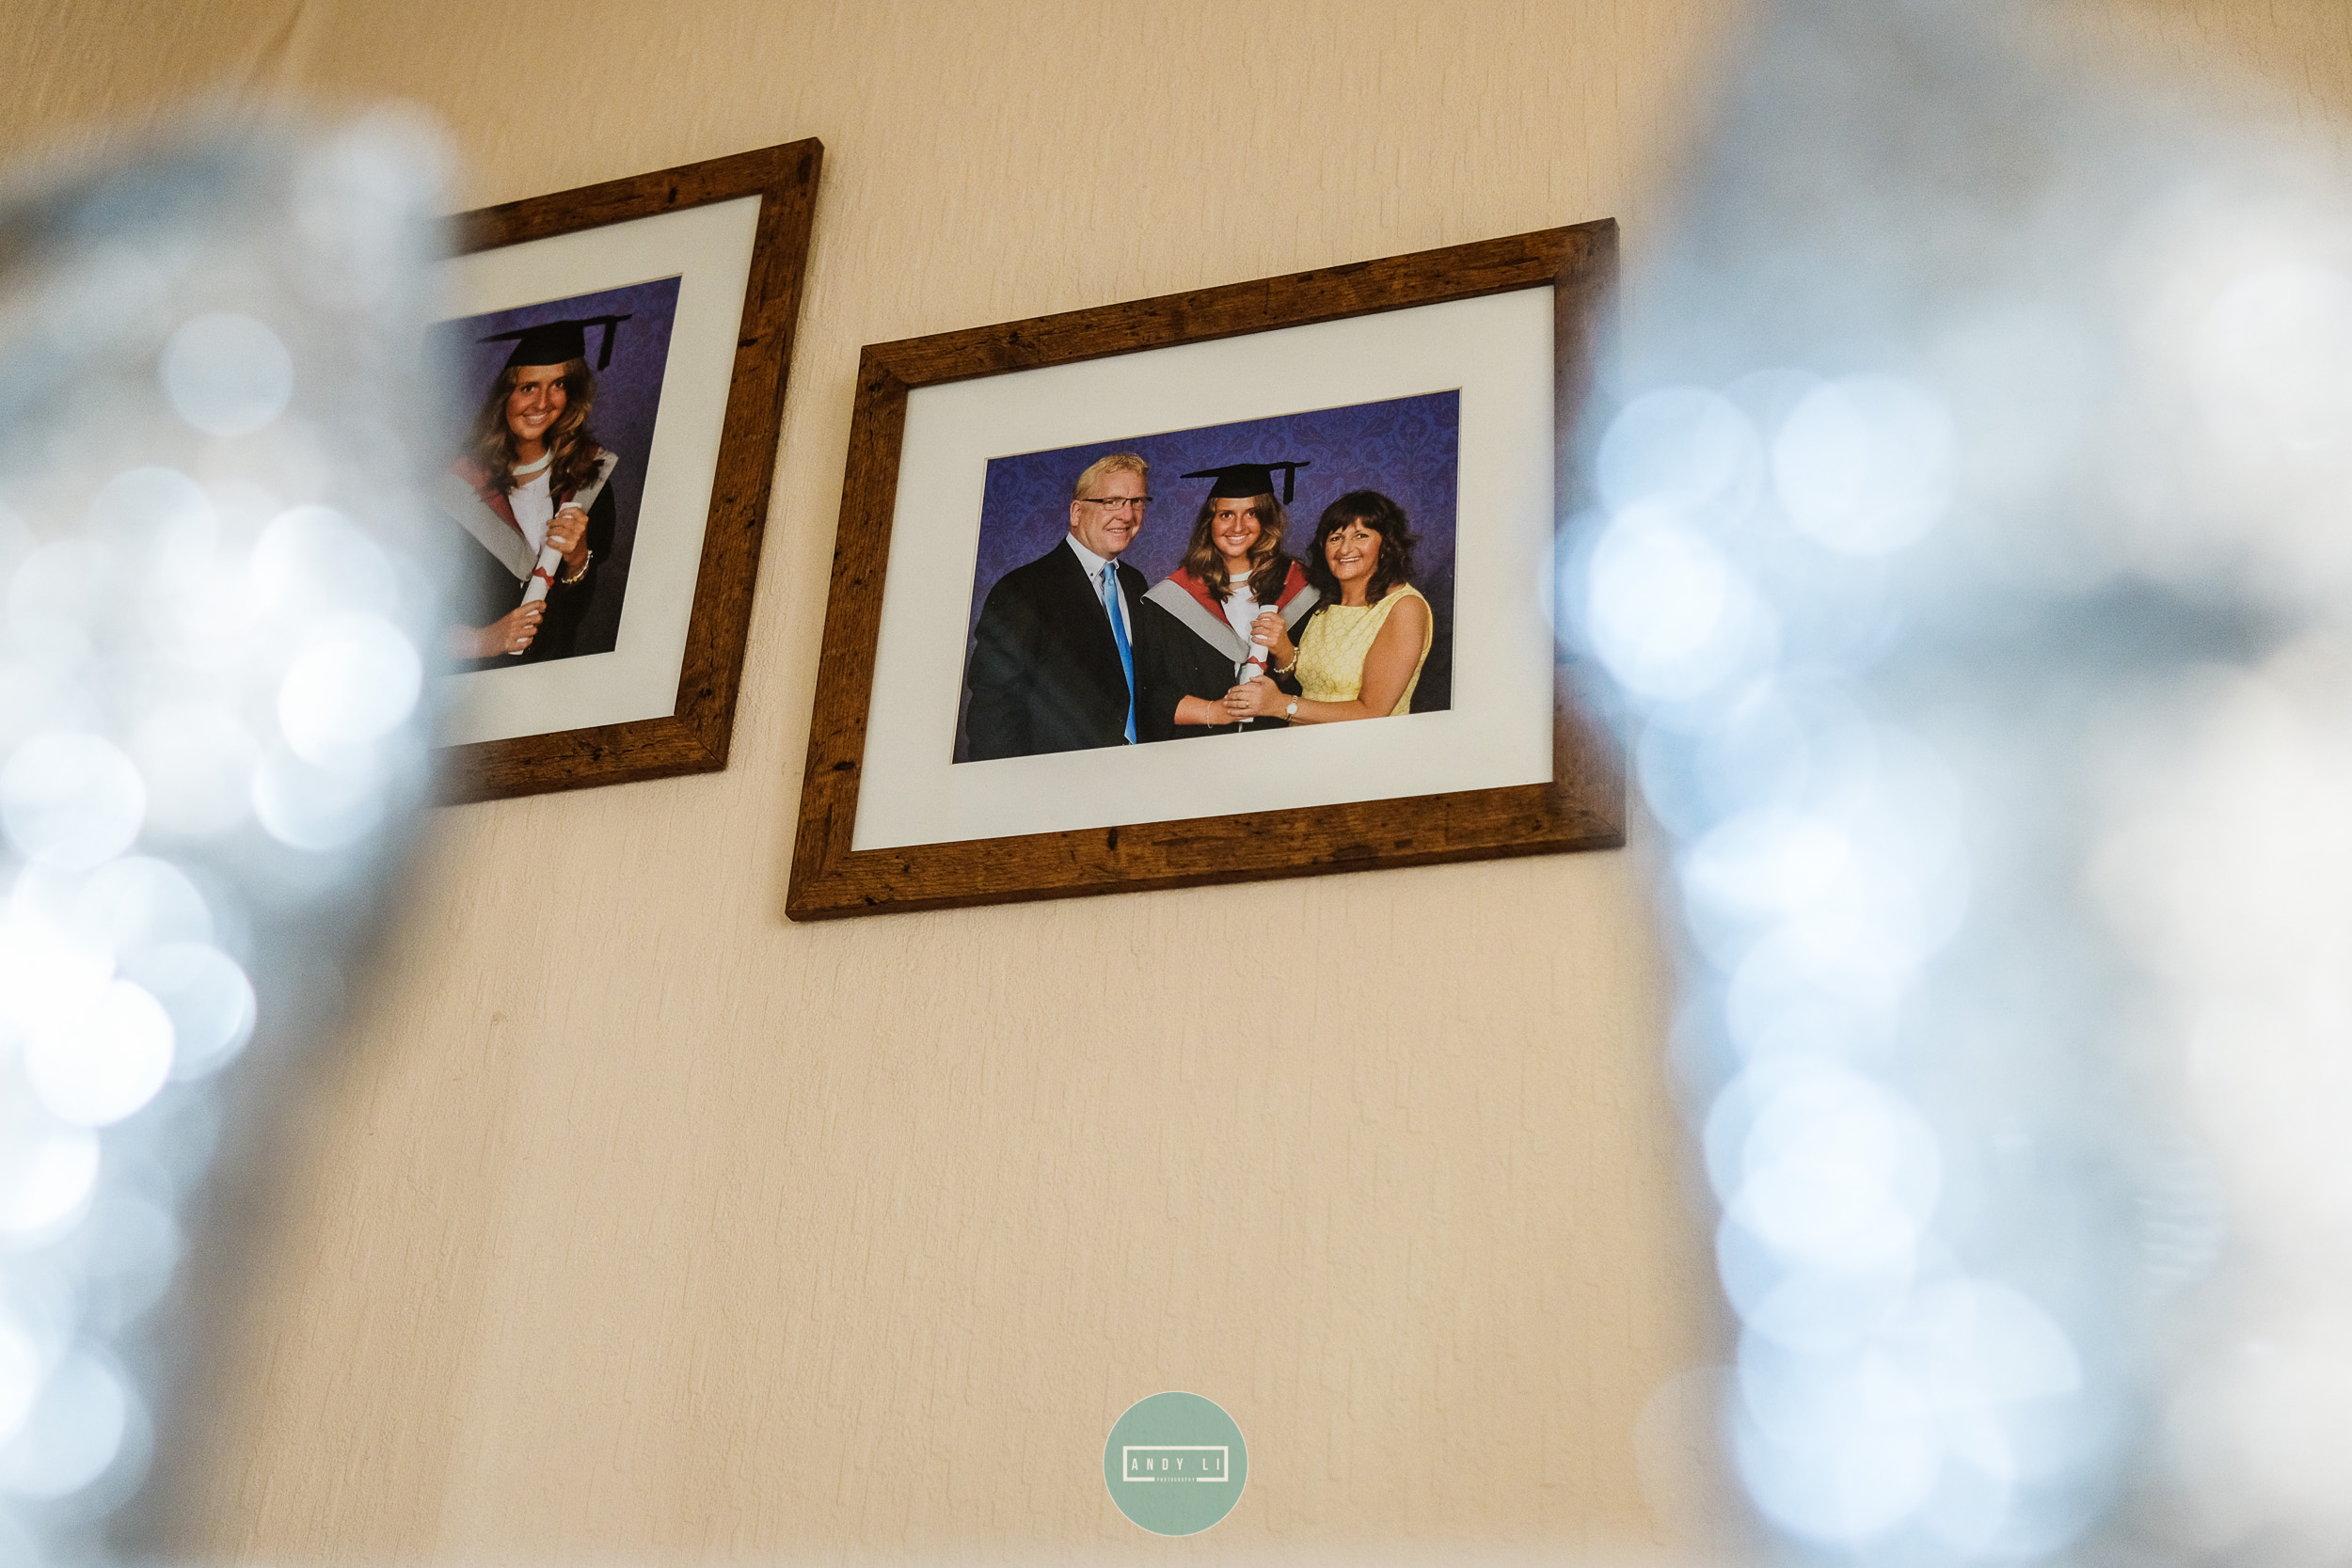 Lilleshall Hall Wedding Photographer-002-AXT21219.jpg